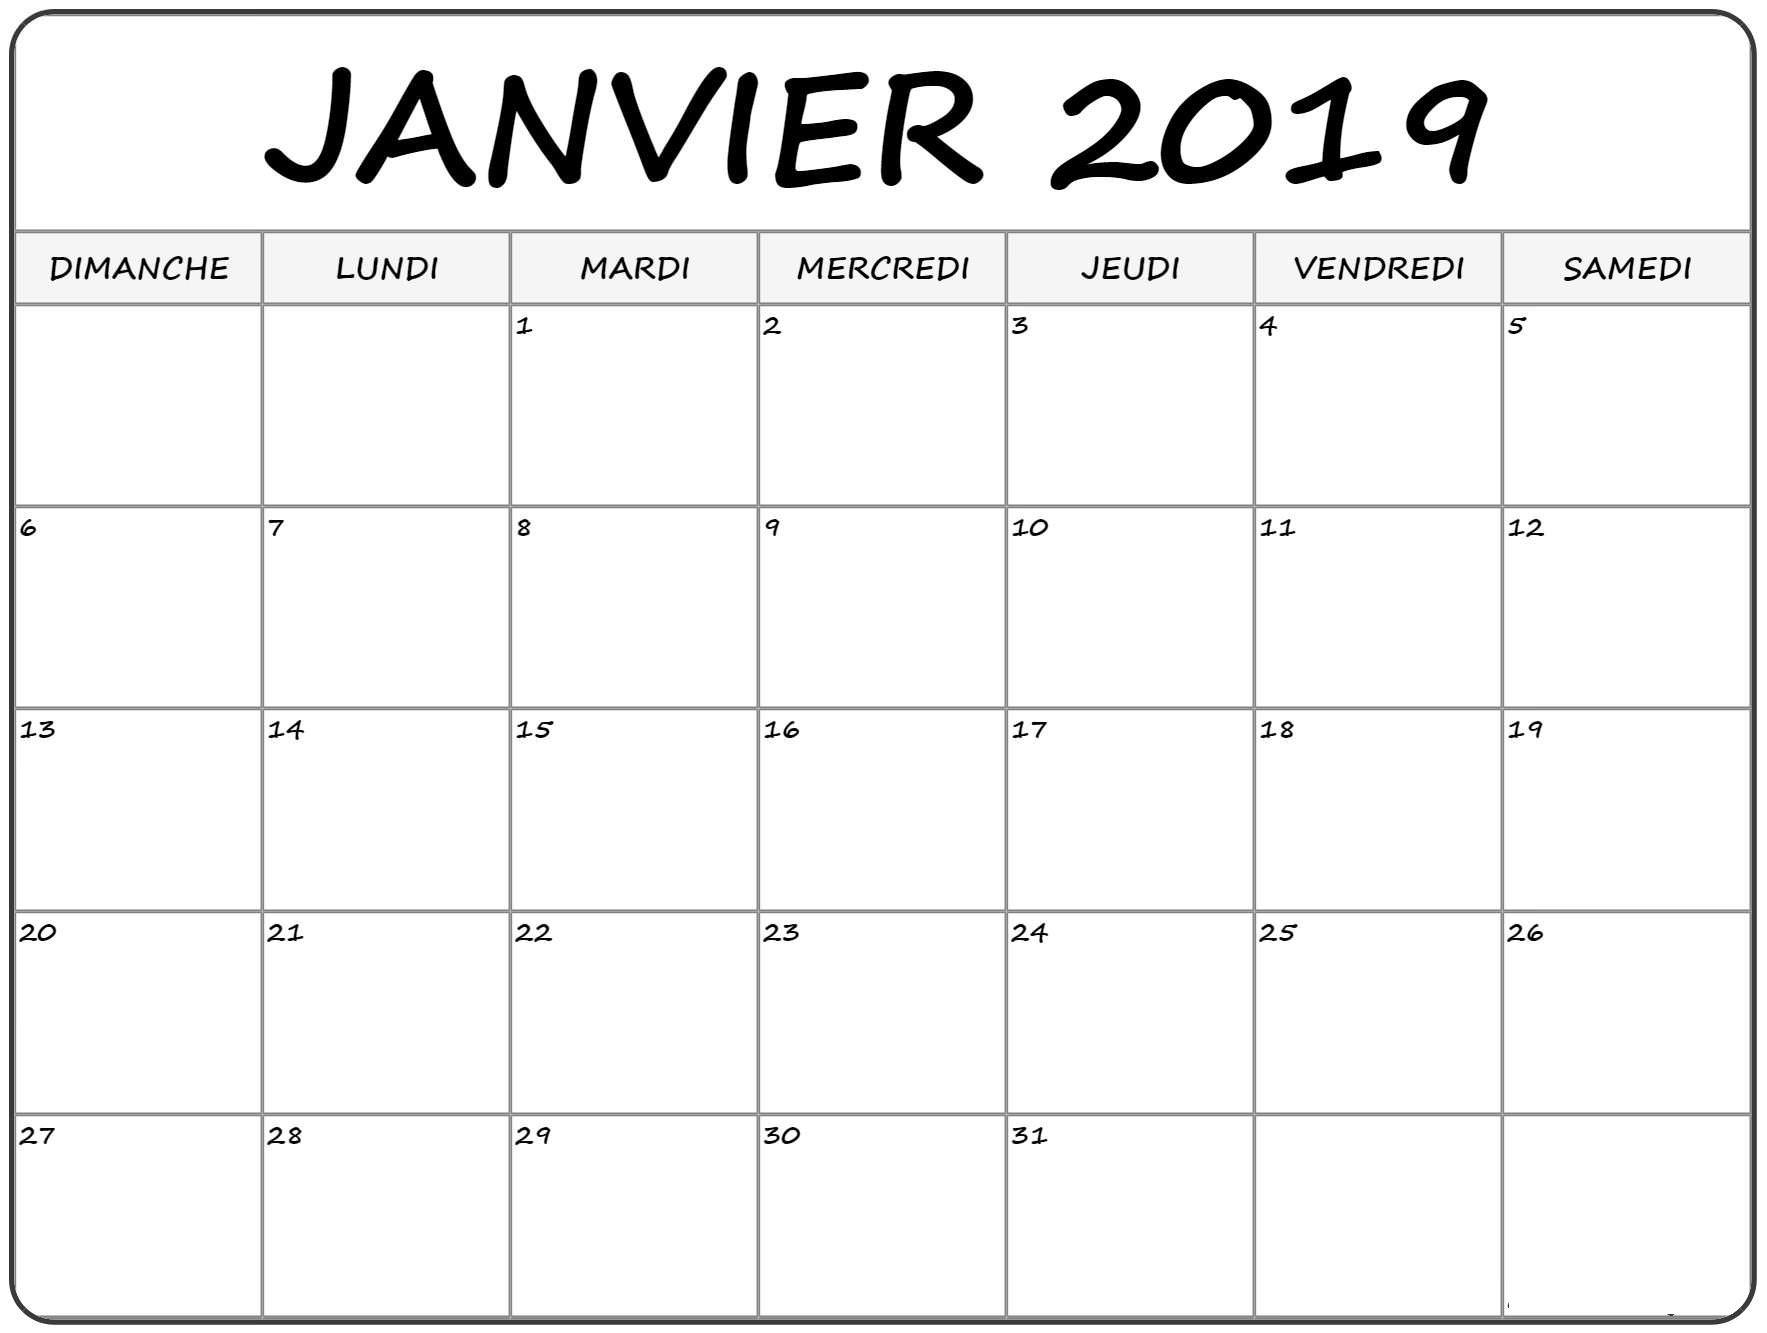 Template Calendrier 2019.Calendrier 2019 Janvier In 2019 January Calendar Blank